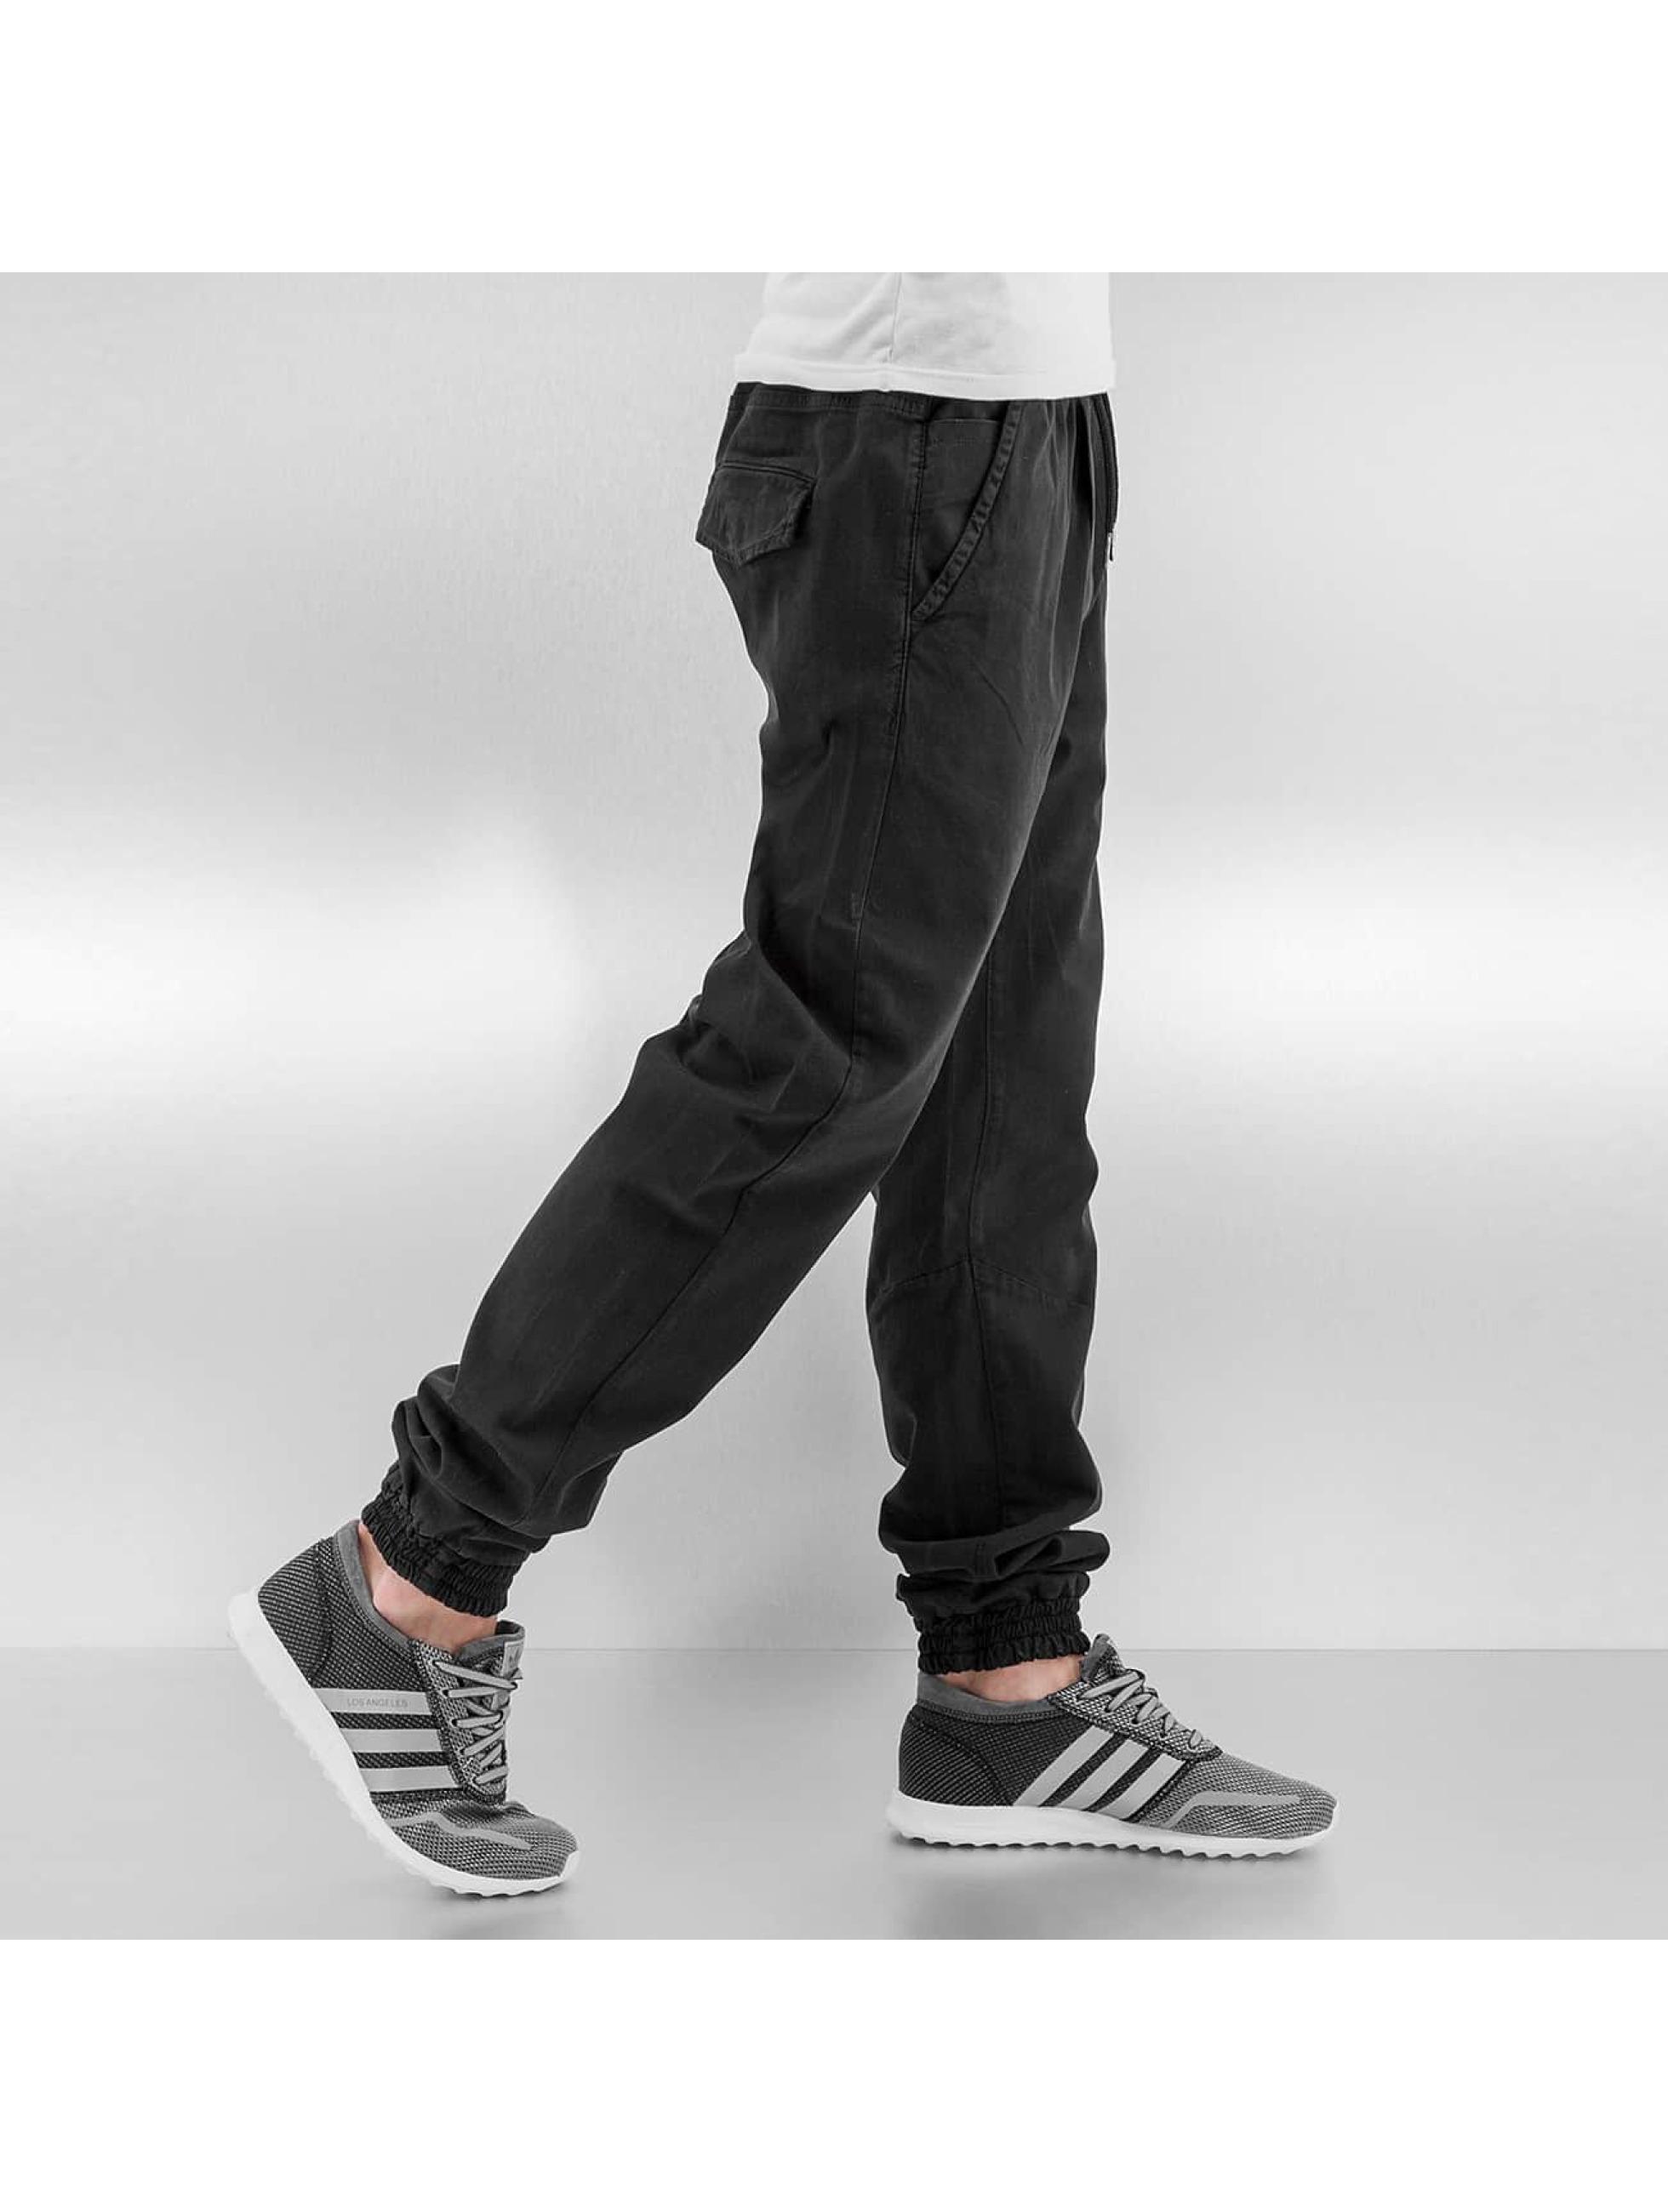 Urban Classics Jogginghose Stretch Twill schwarz